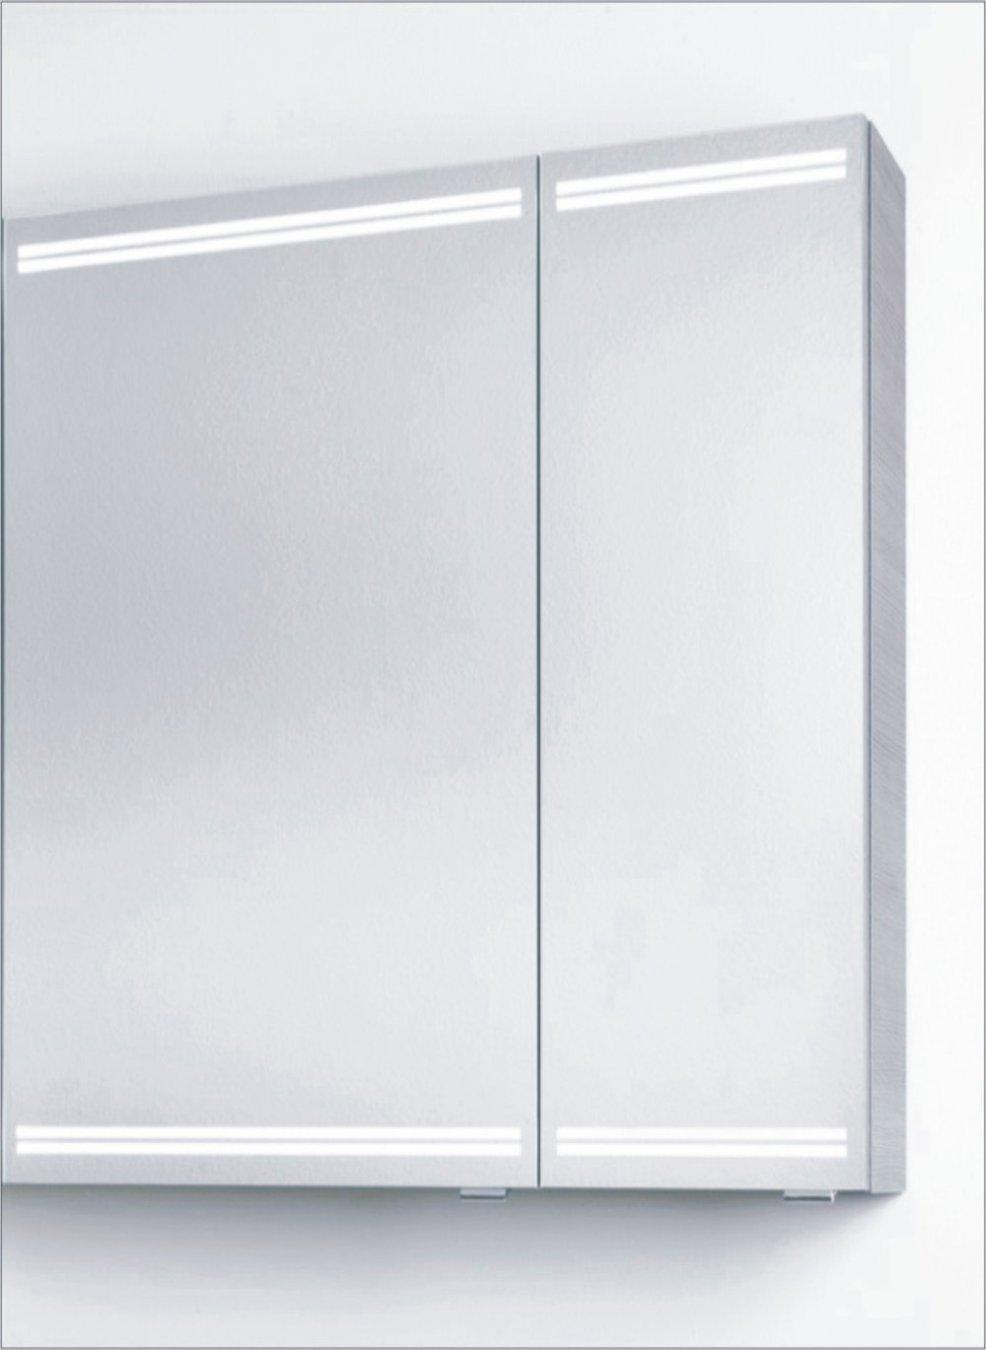 pelipal pcon spiegelschrank 70 cm g nstig online. Black Bedroom Furniture Sets. Home Design Ideas